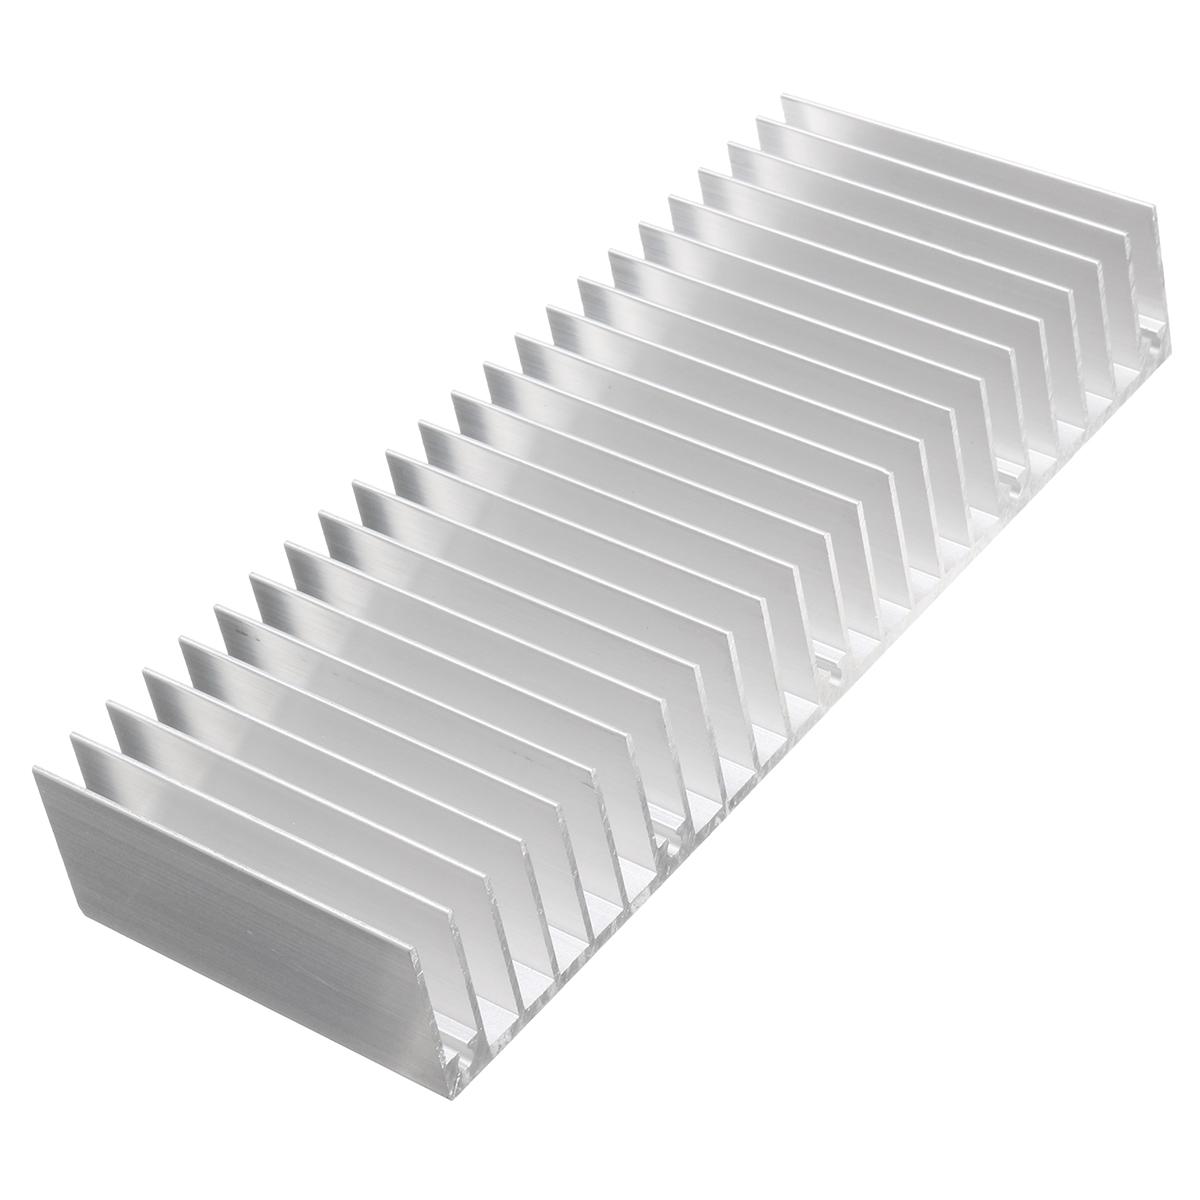 150x60x25mm Aluminum Heat Sink For Electronics Computer